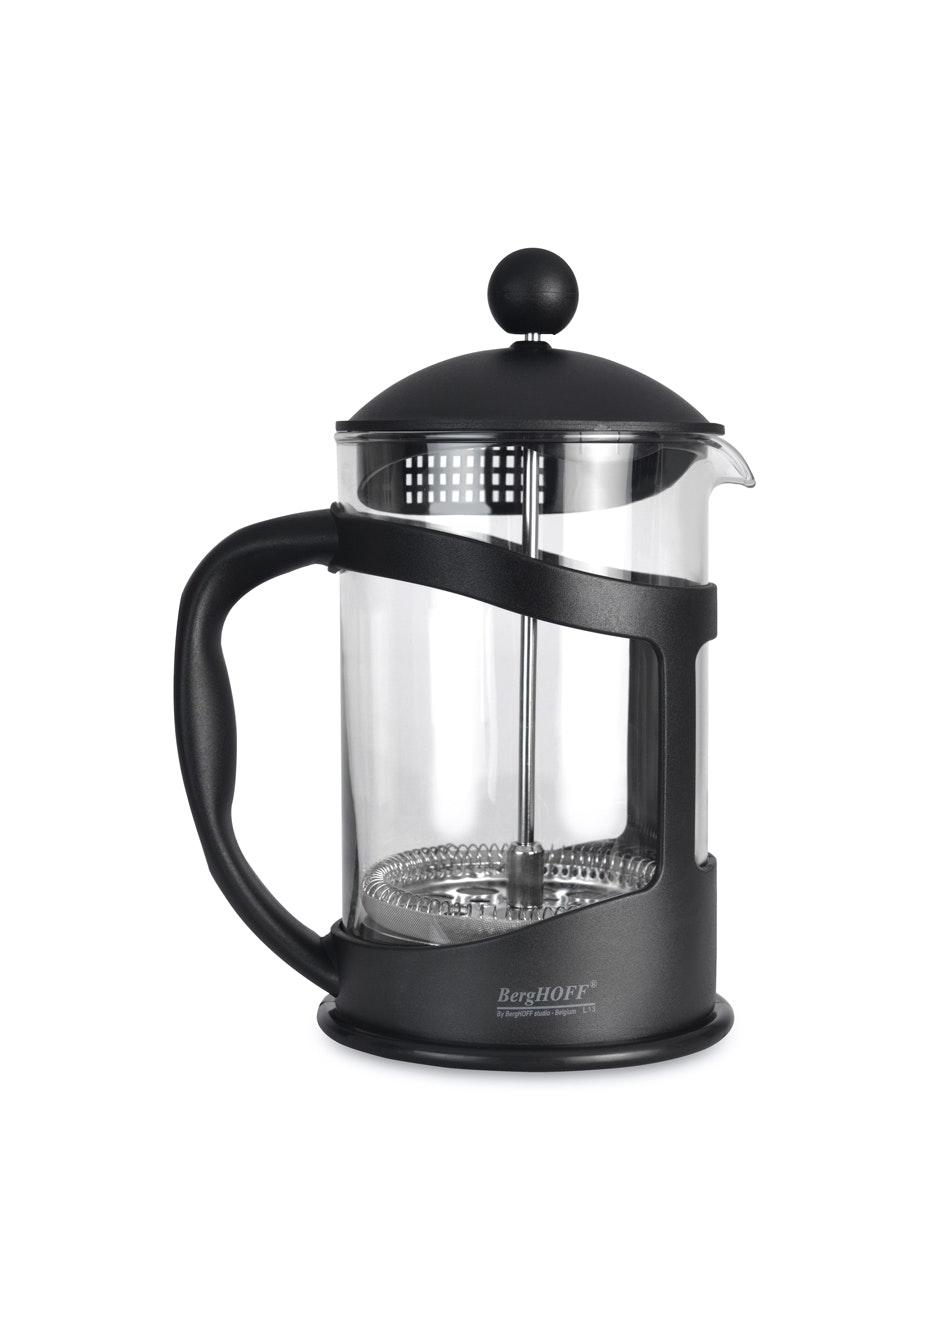 Berghoff Coffee / Tea Plunger Black 1.1L